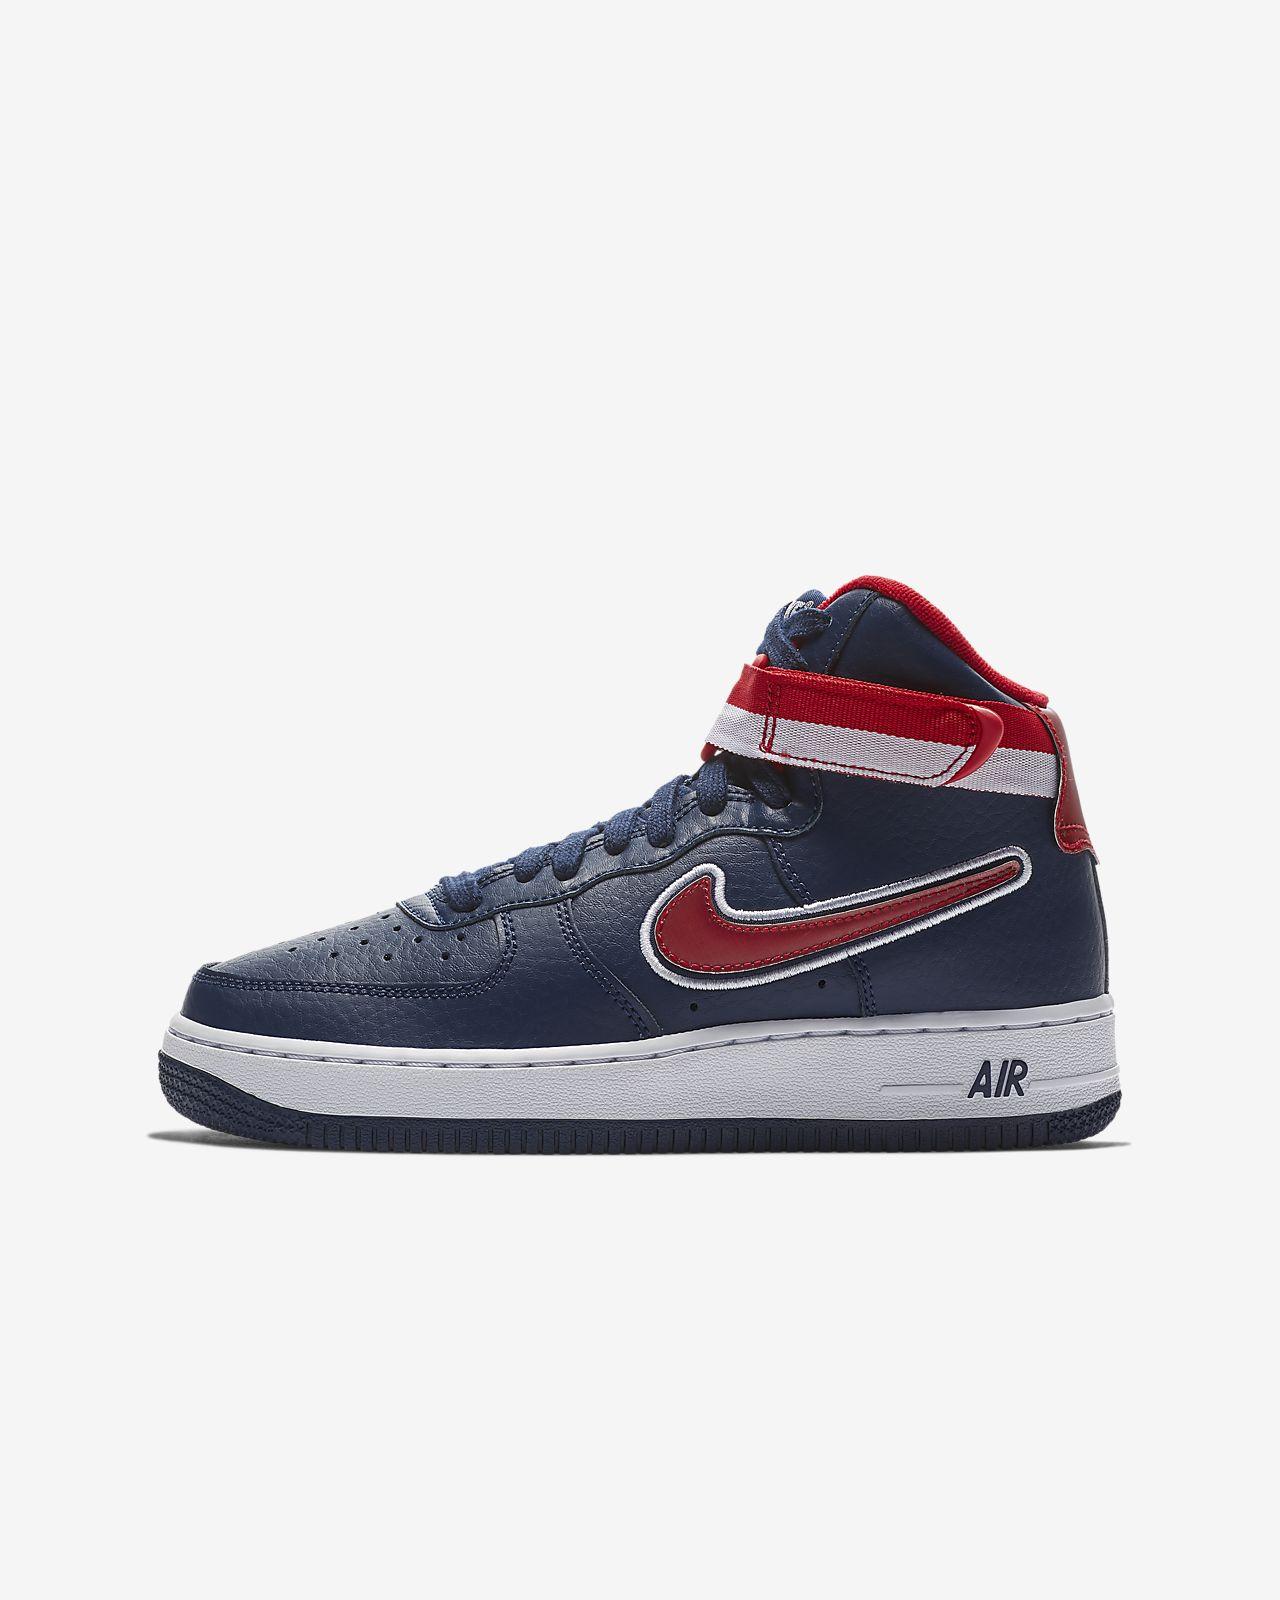 5d8053170fd Nike Air Force 1 '07 High LV8 Sport NBA Older Kids' Shoe. Nike.com VN